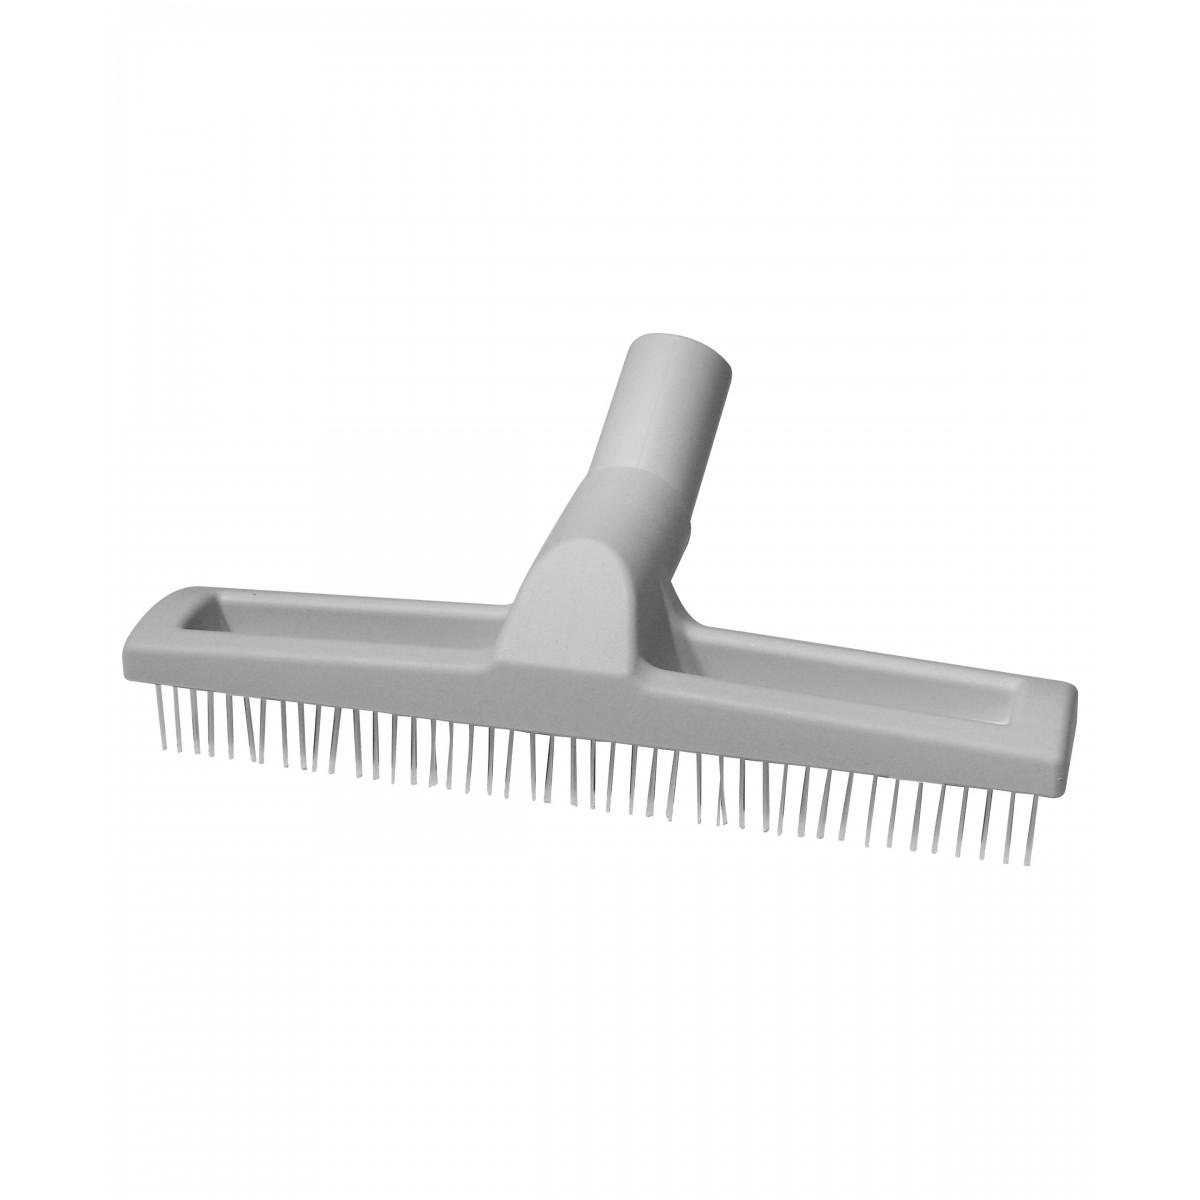 brosse pour tapis longs poils 12 39 gris wessel werk. Black Bedroom Furniture Sets. Home Design Ideas